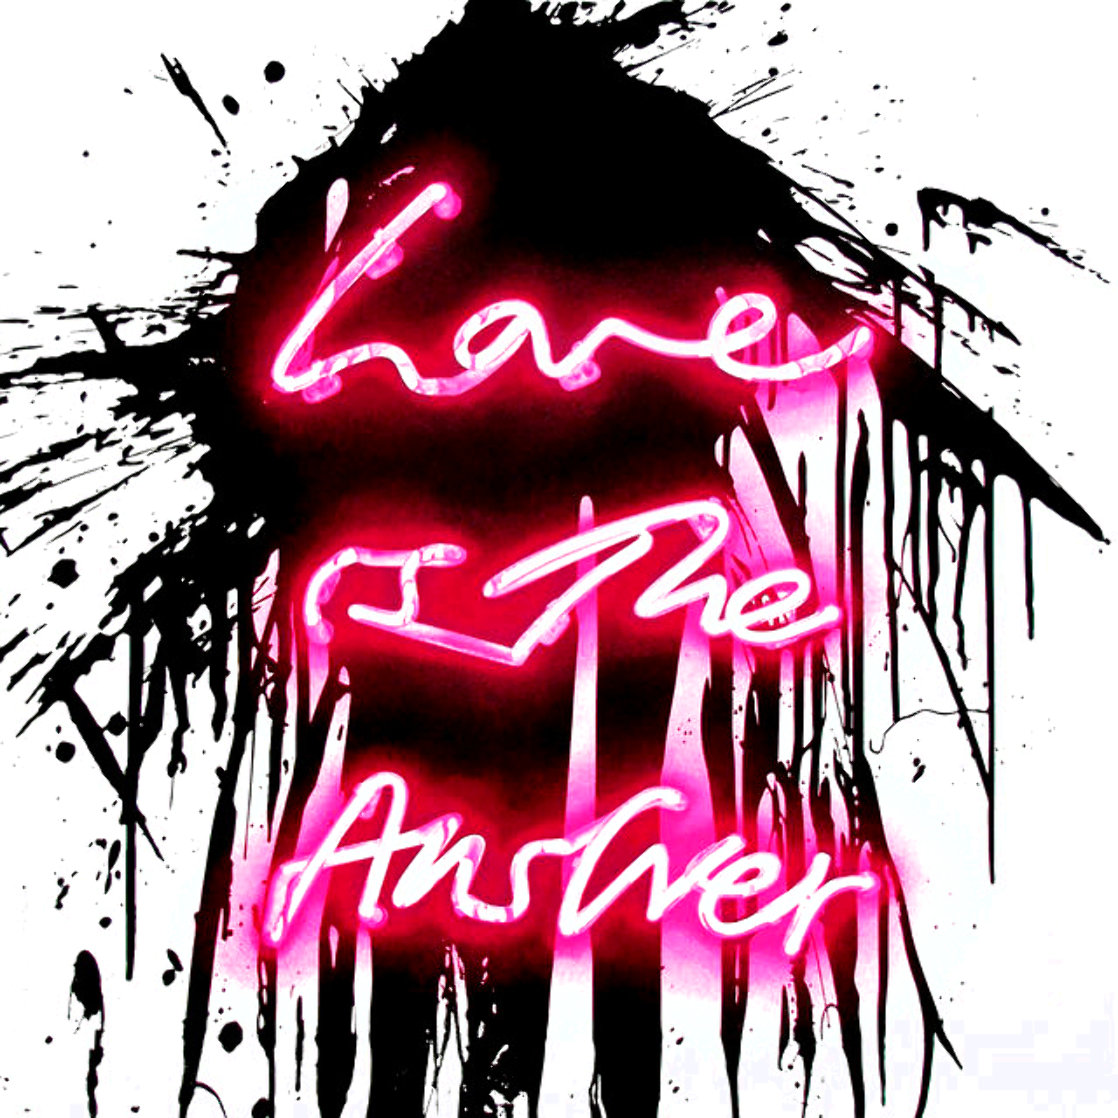 Love On 2018 Limited Edition Print by Mr. Brainwash